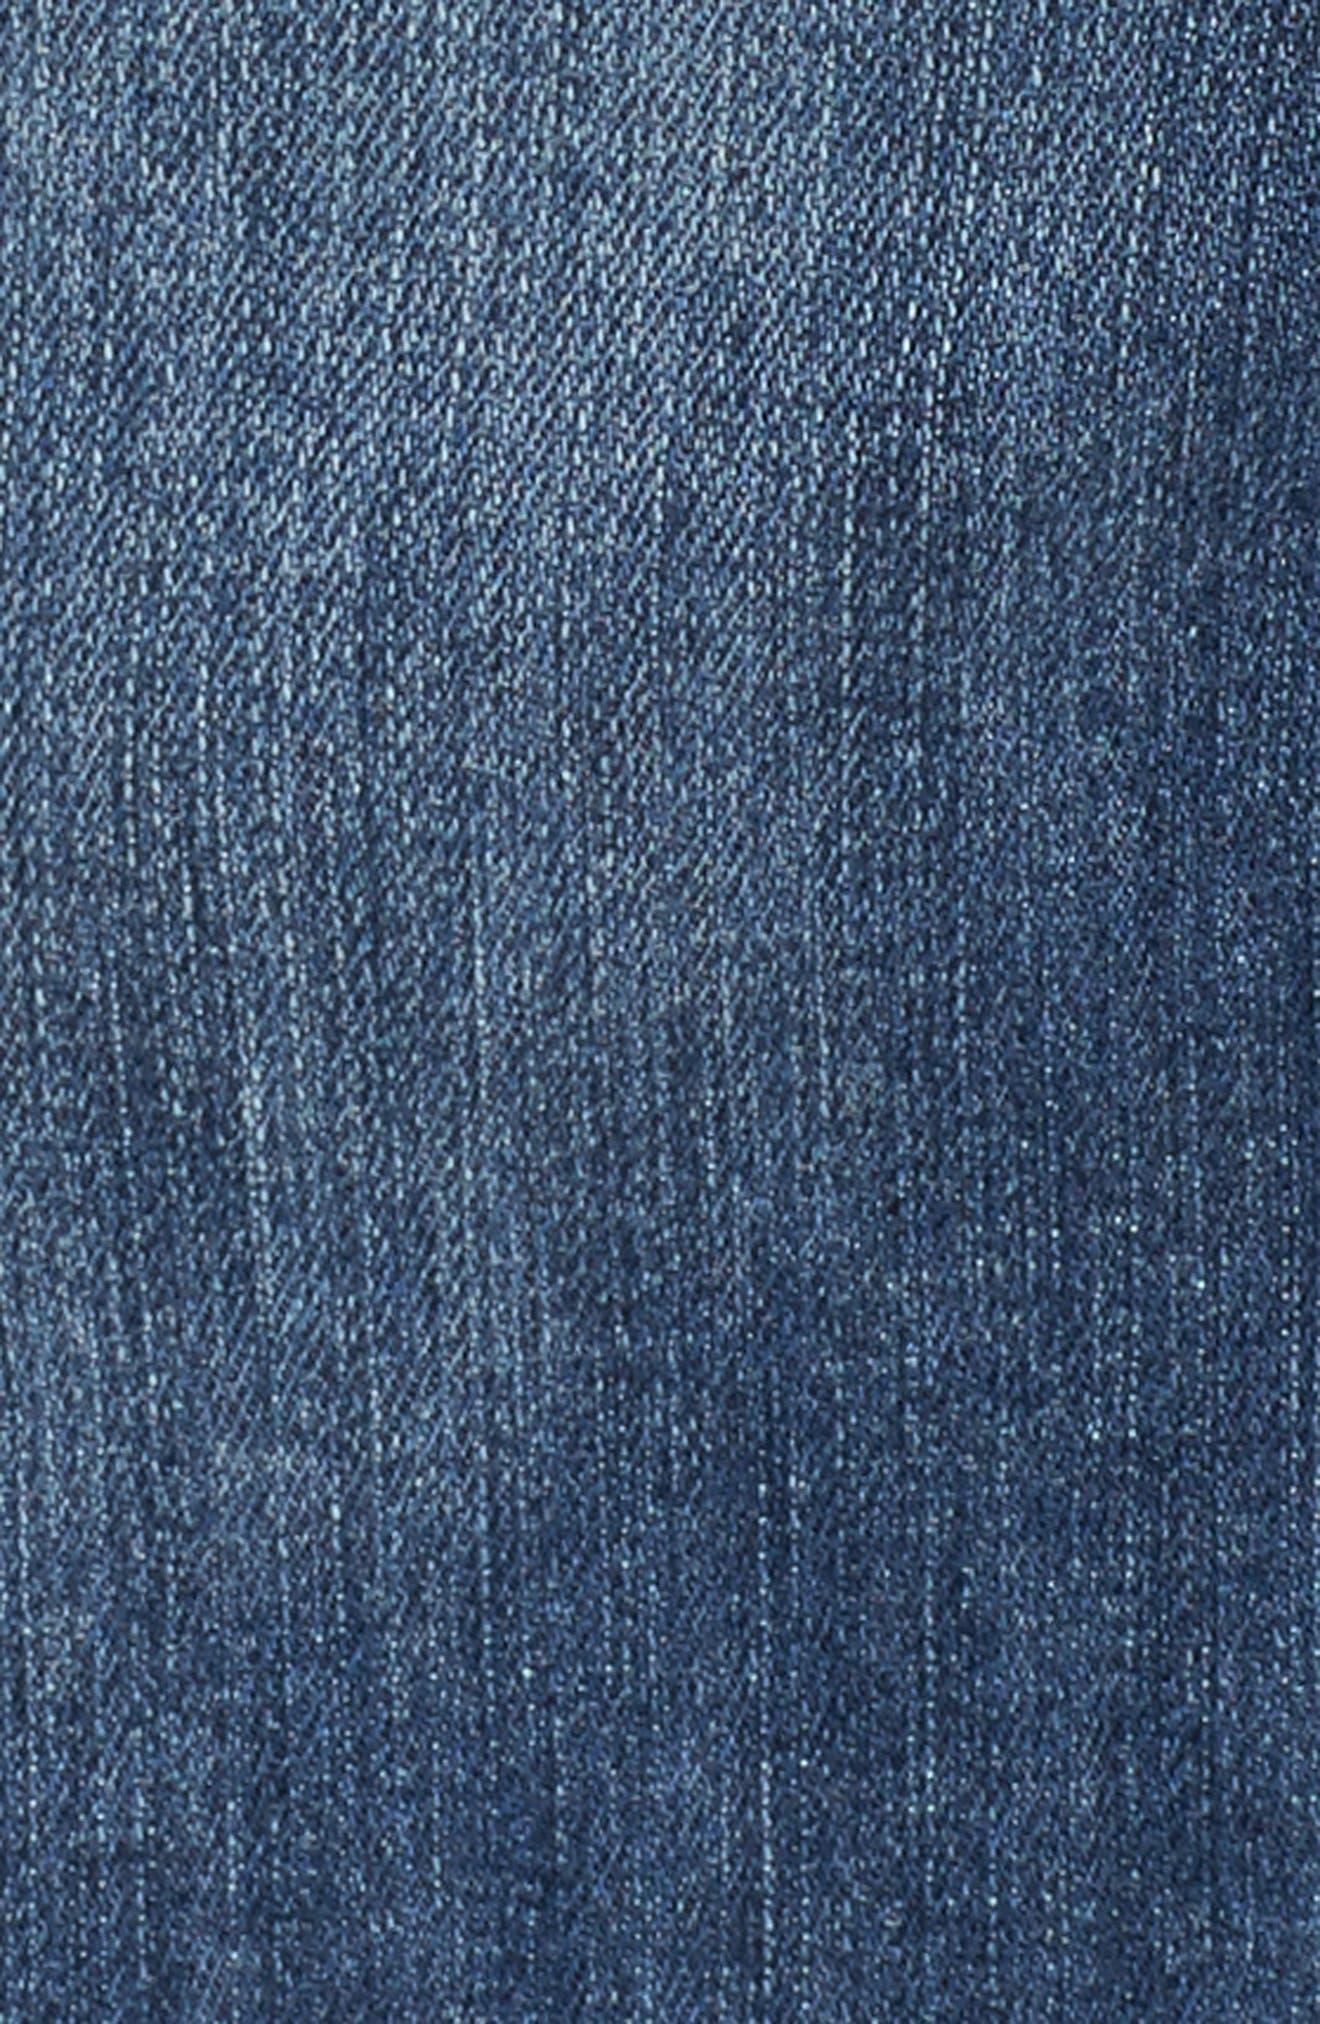 Distressed Denim Jacket,                             Alternate thumbnail 5, color,                             400